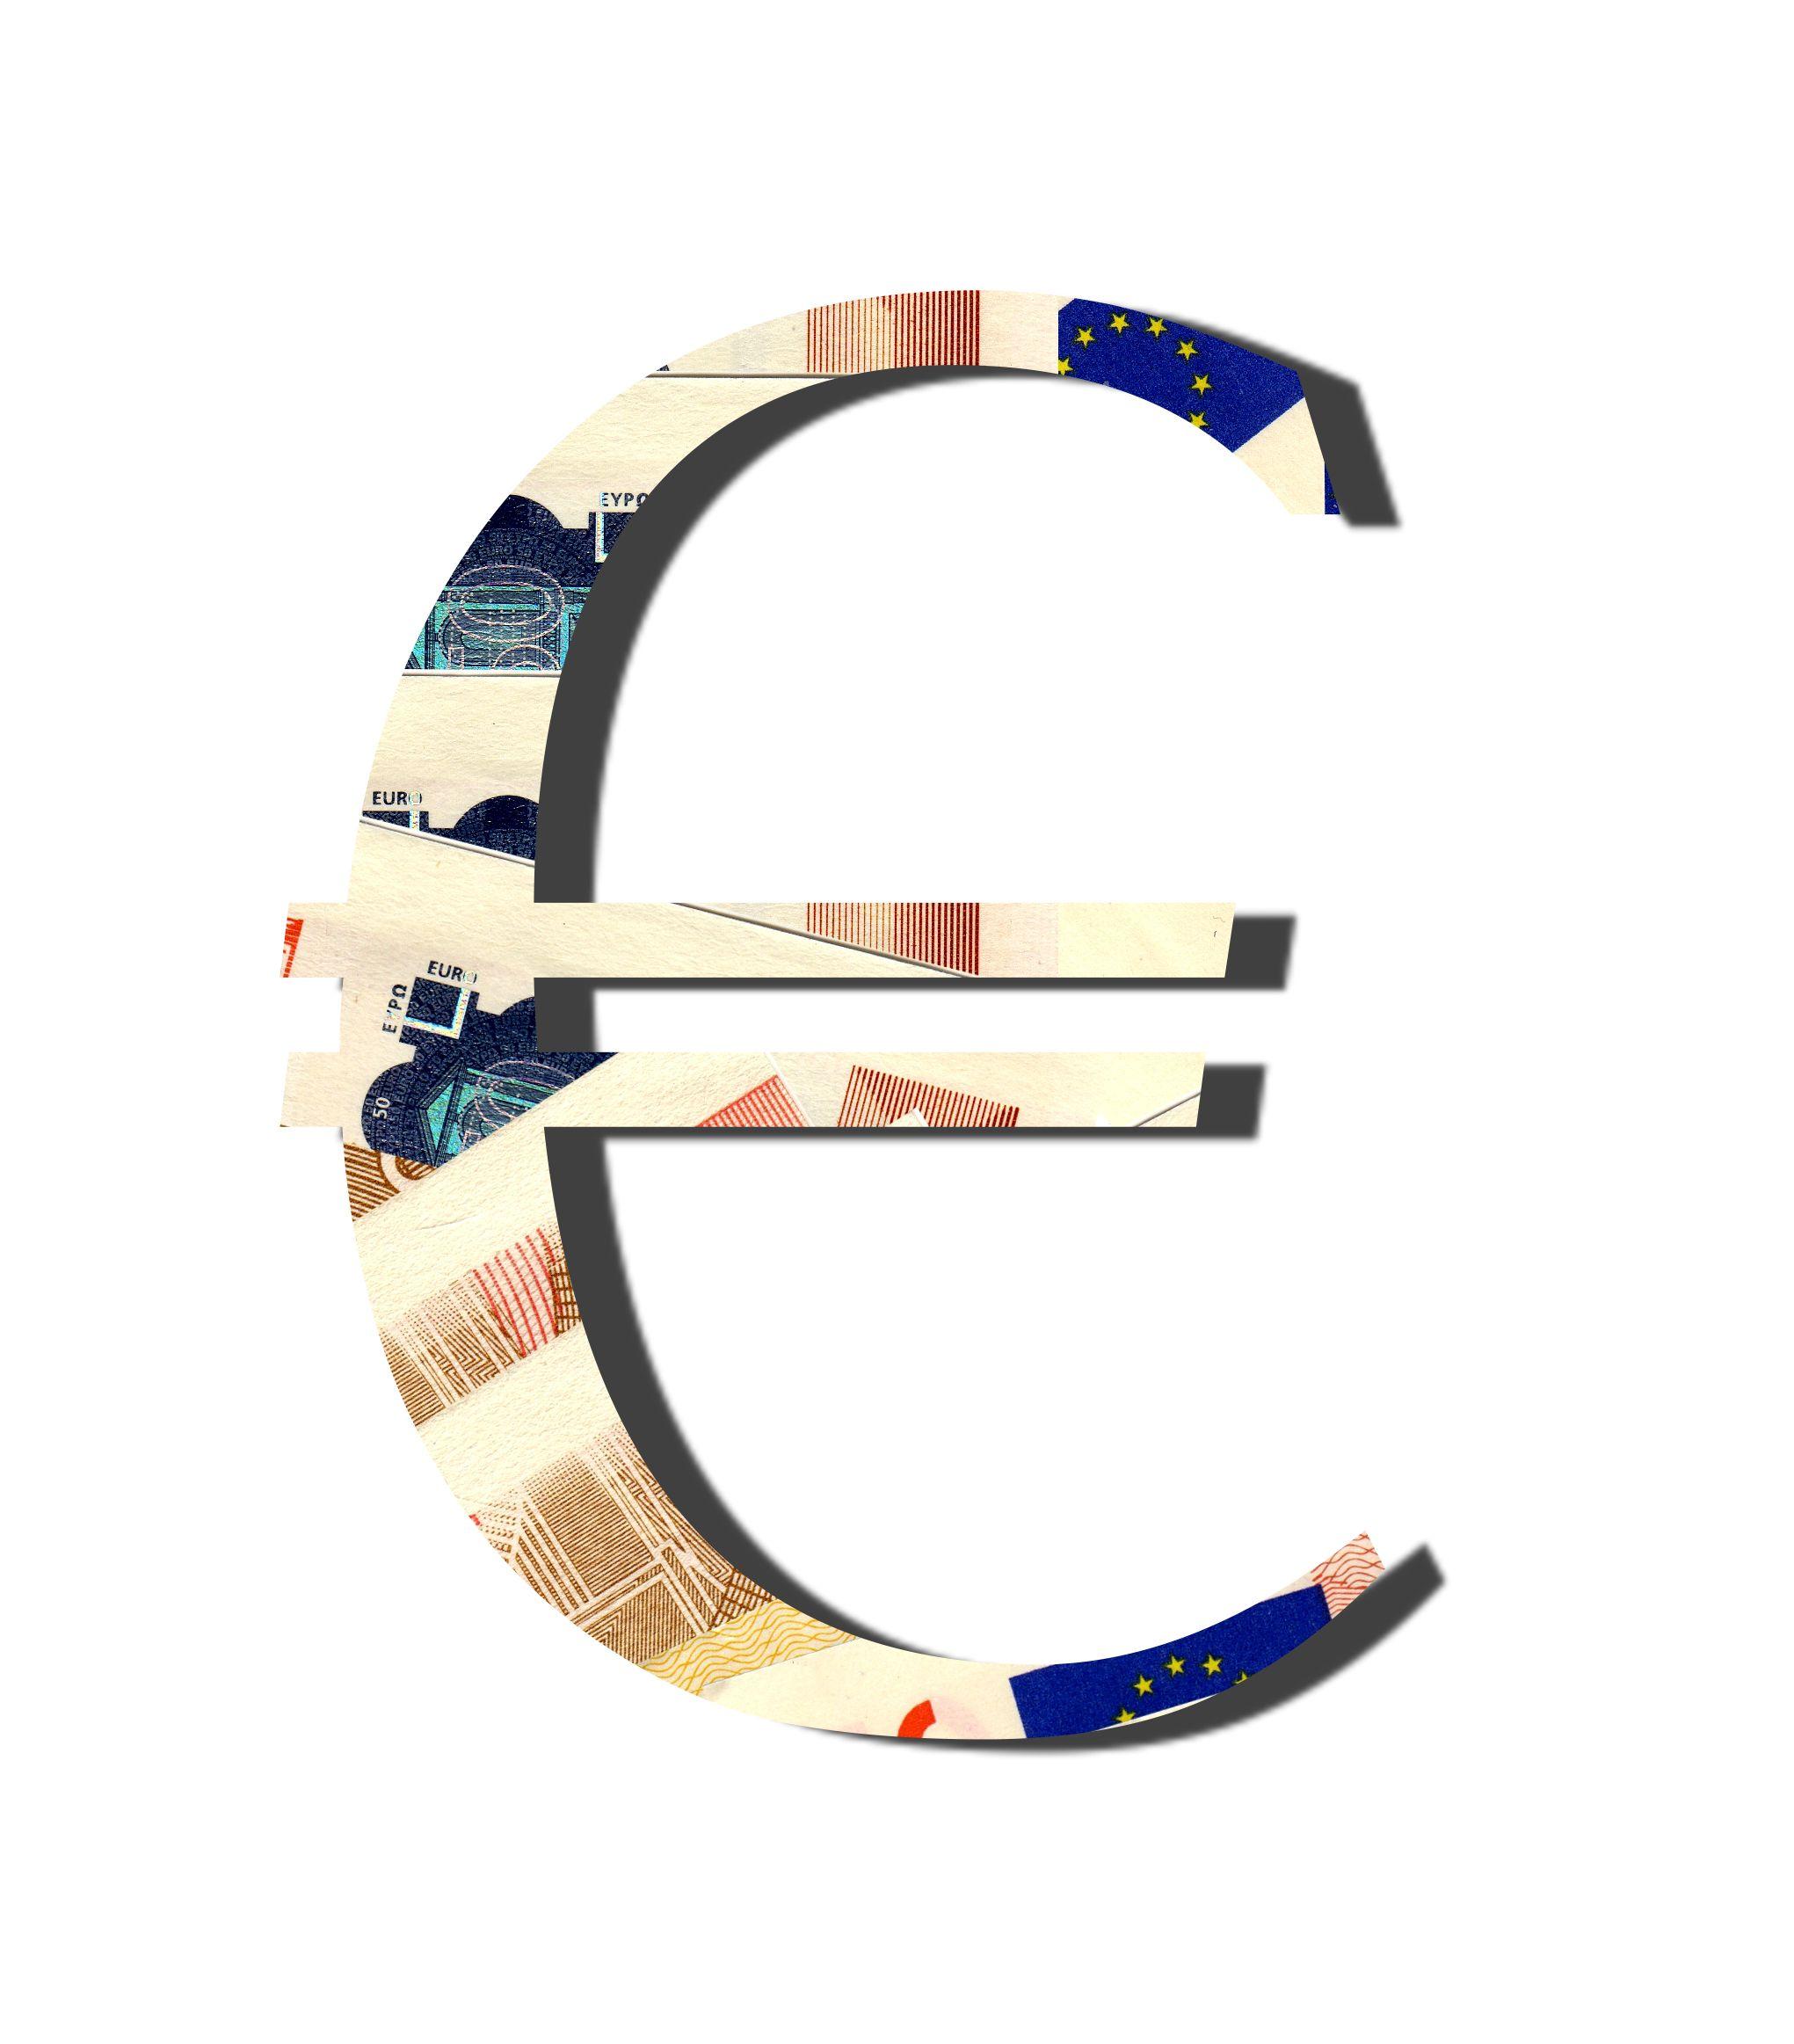 moneymorning.com